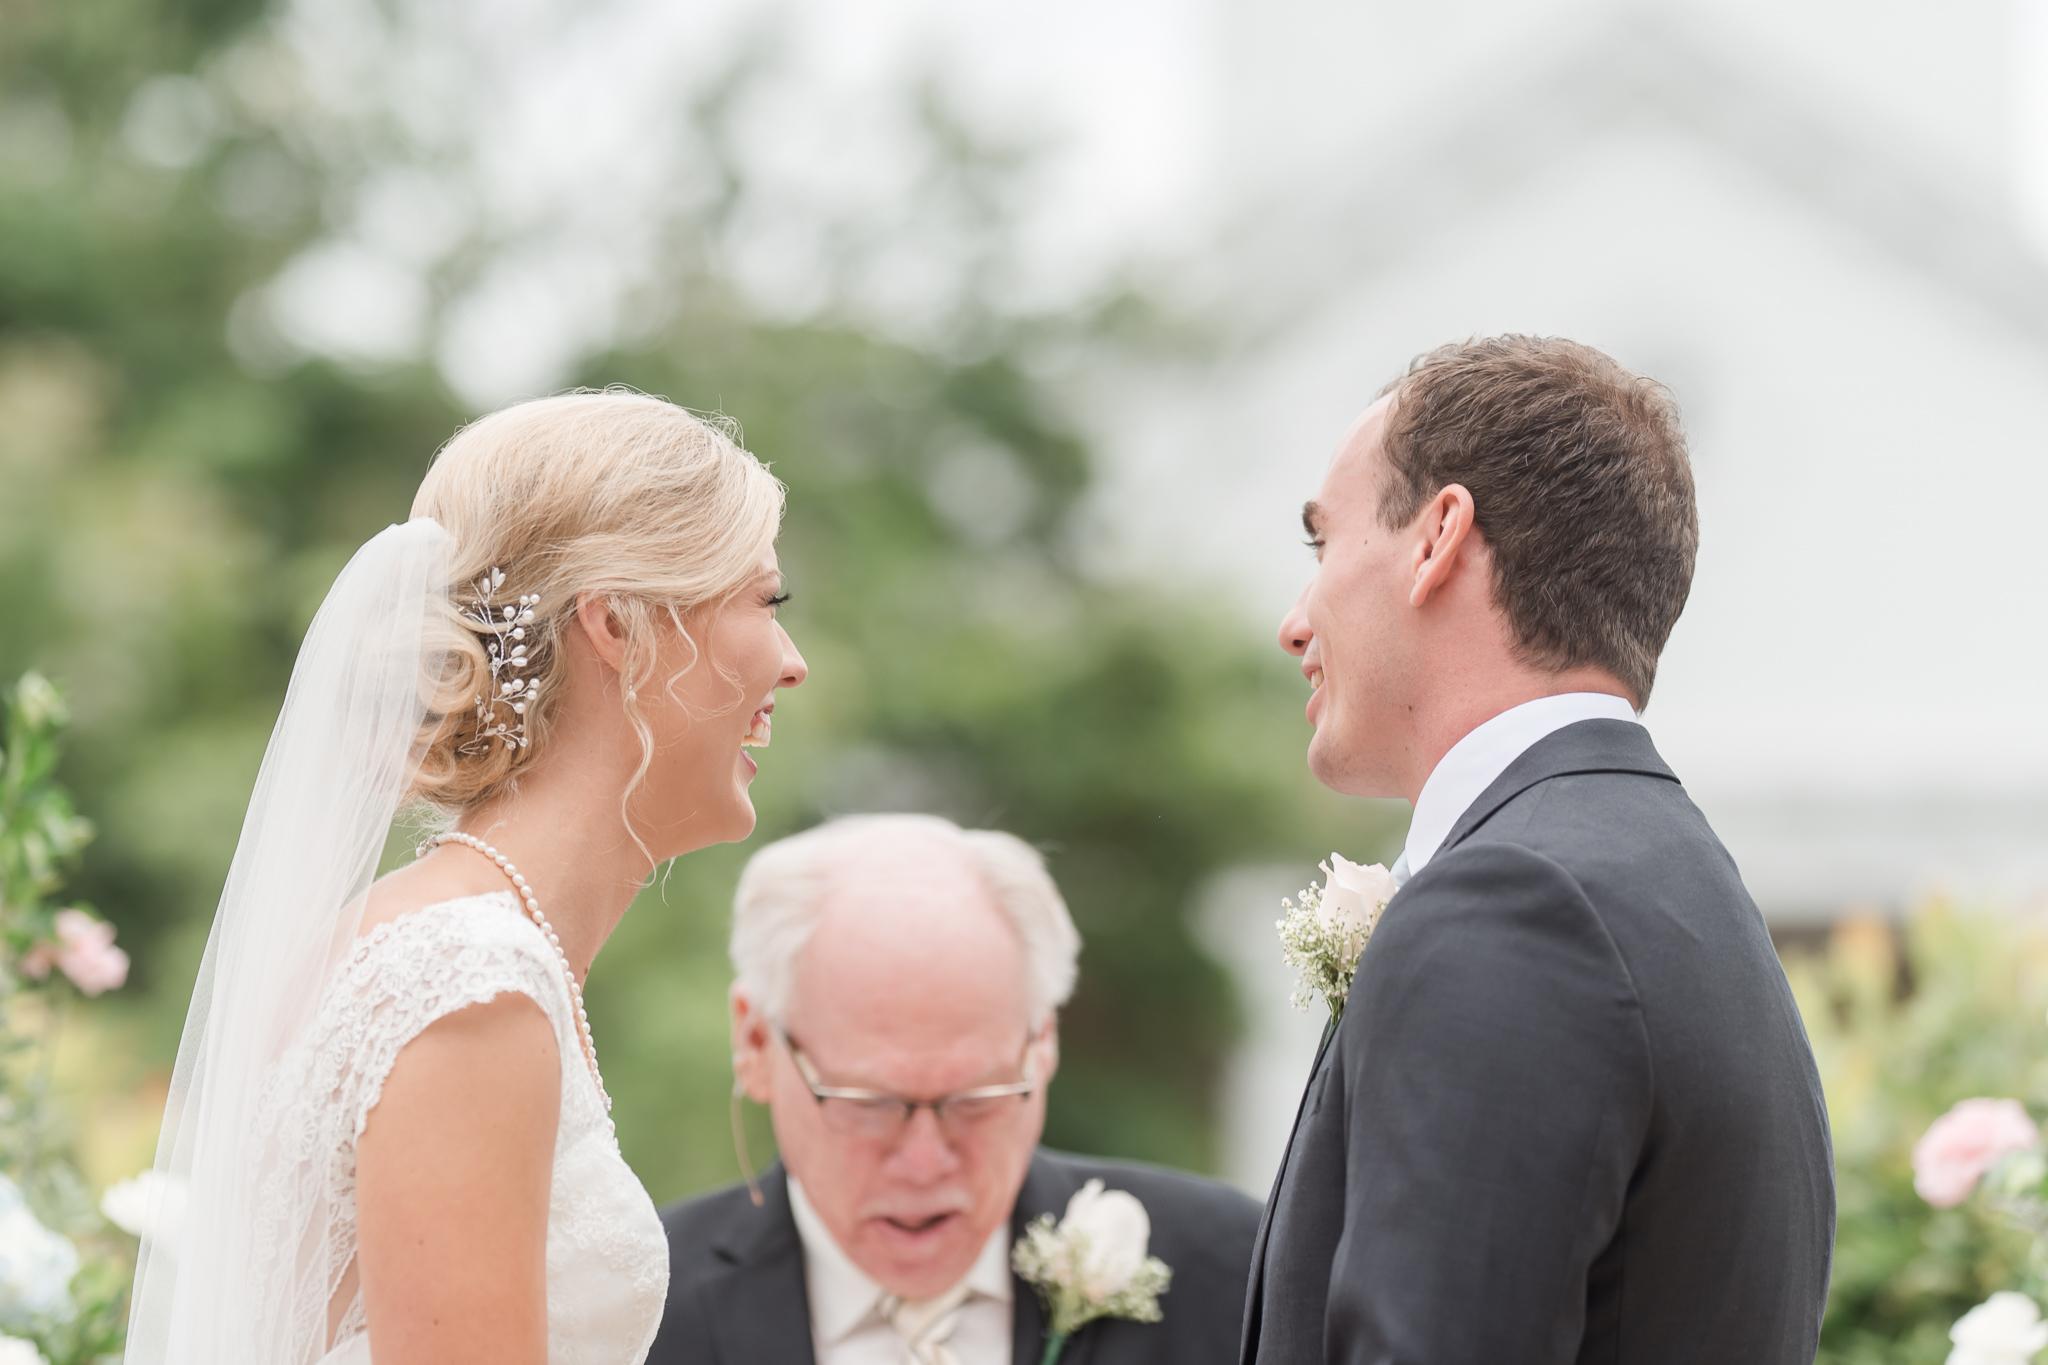 Westminister Hall Wedding Winona Lake Indiana9392.jpg